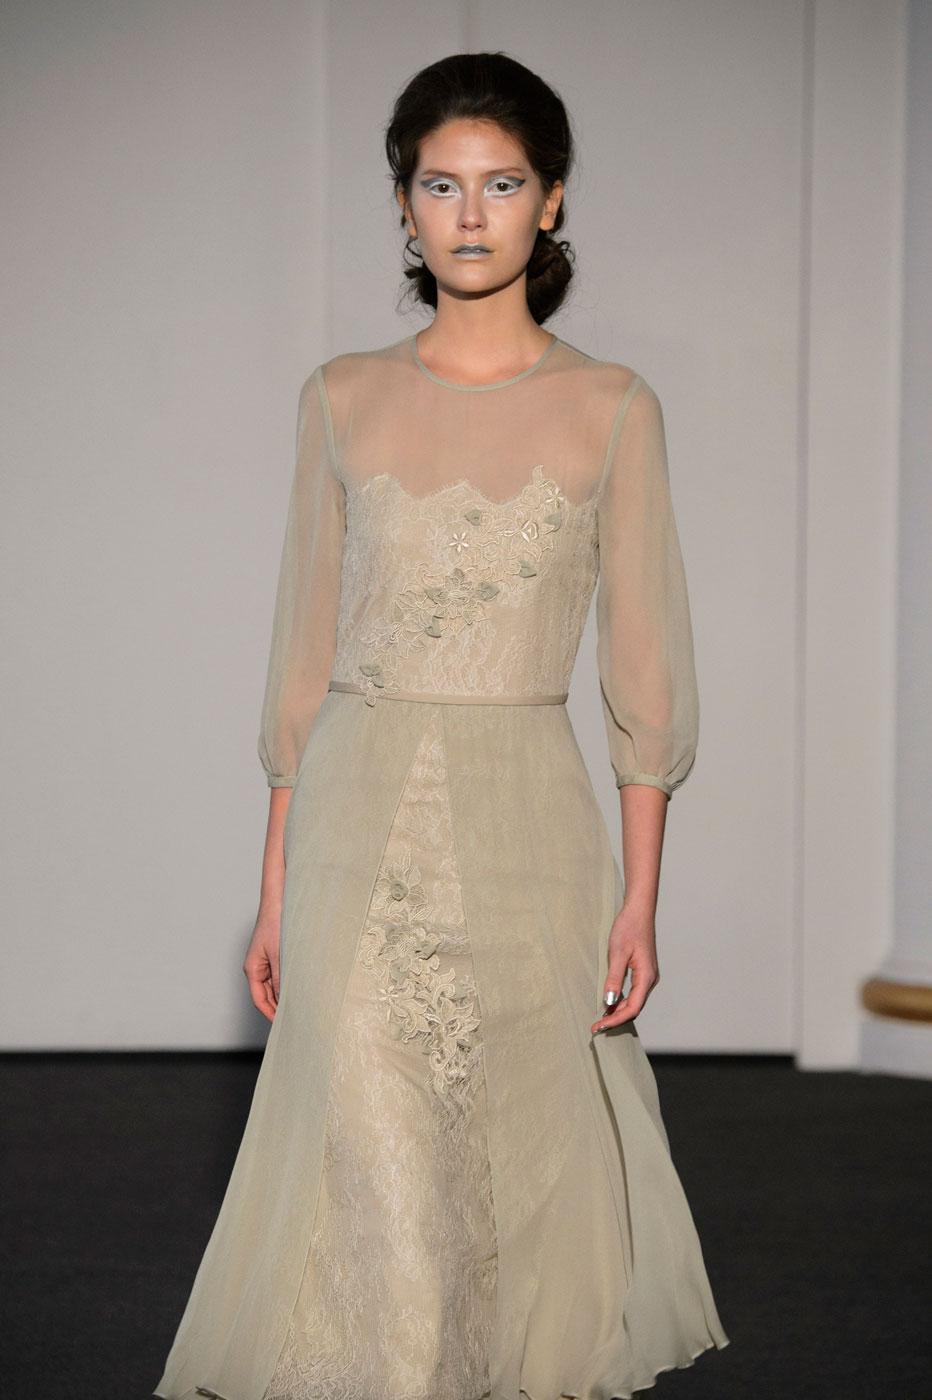 Busardi-fashion-runway-show-haute-couture-paris-spring-2015-the-impression-20